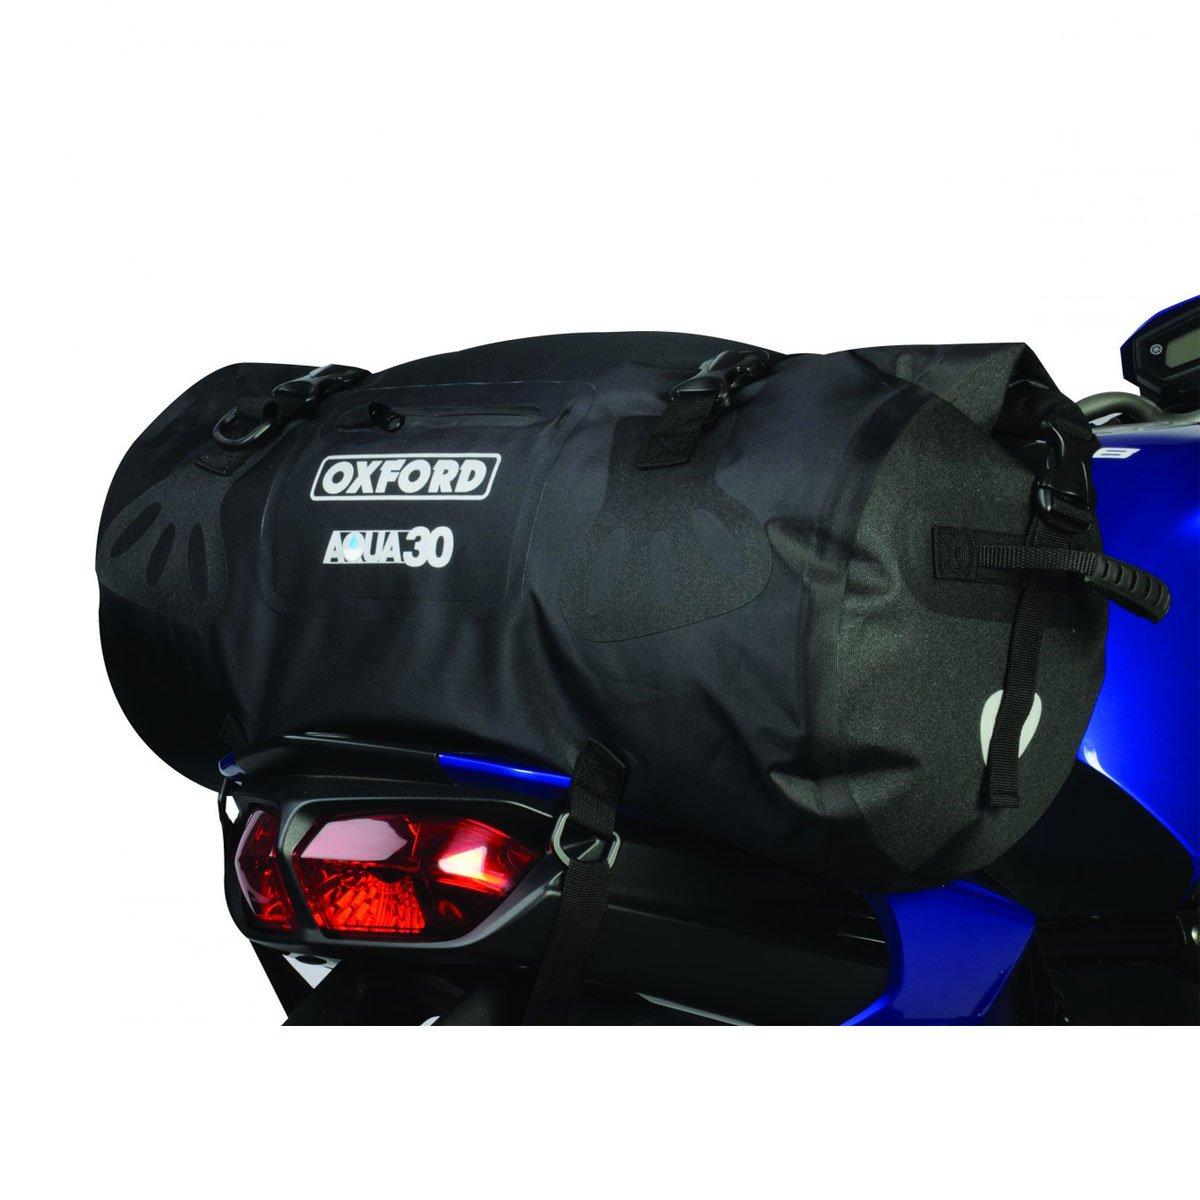 Oxford Motorcycle Aqua30 All Weather Waterproof Roll Top Bag Luggage OL910